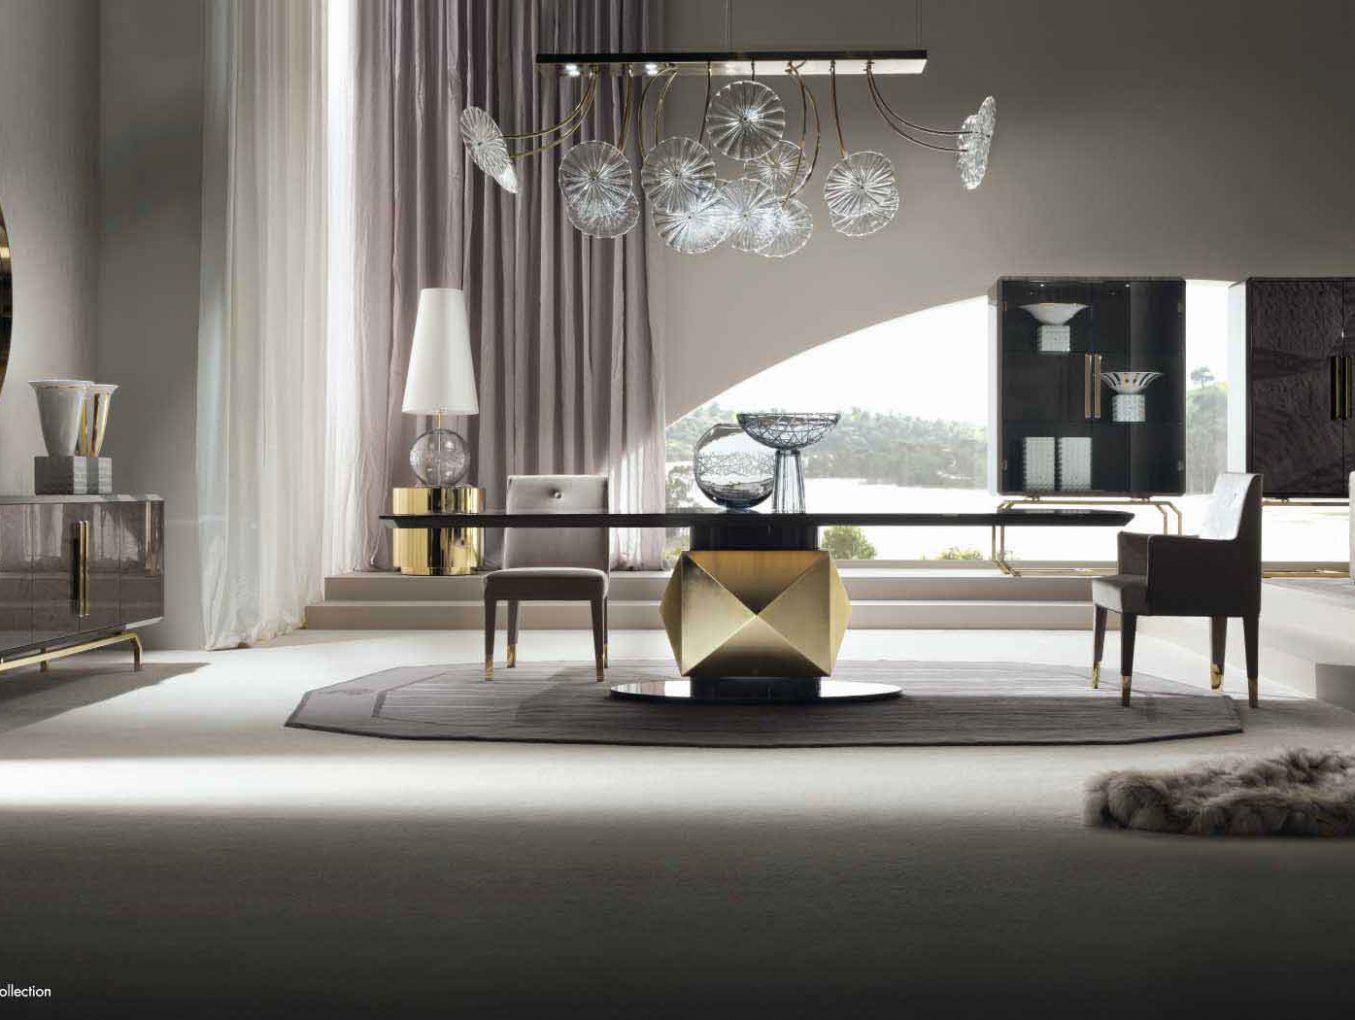 Infinity новая коллекция бренда Giorgio collection